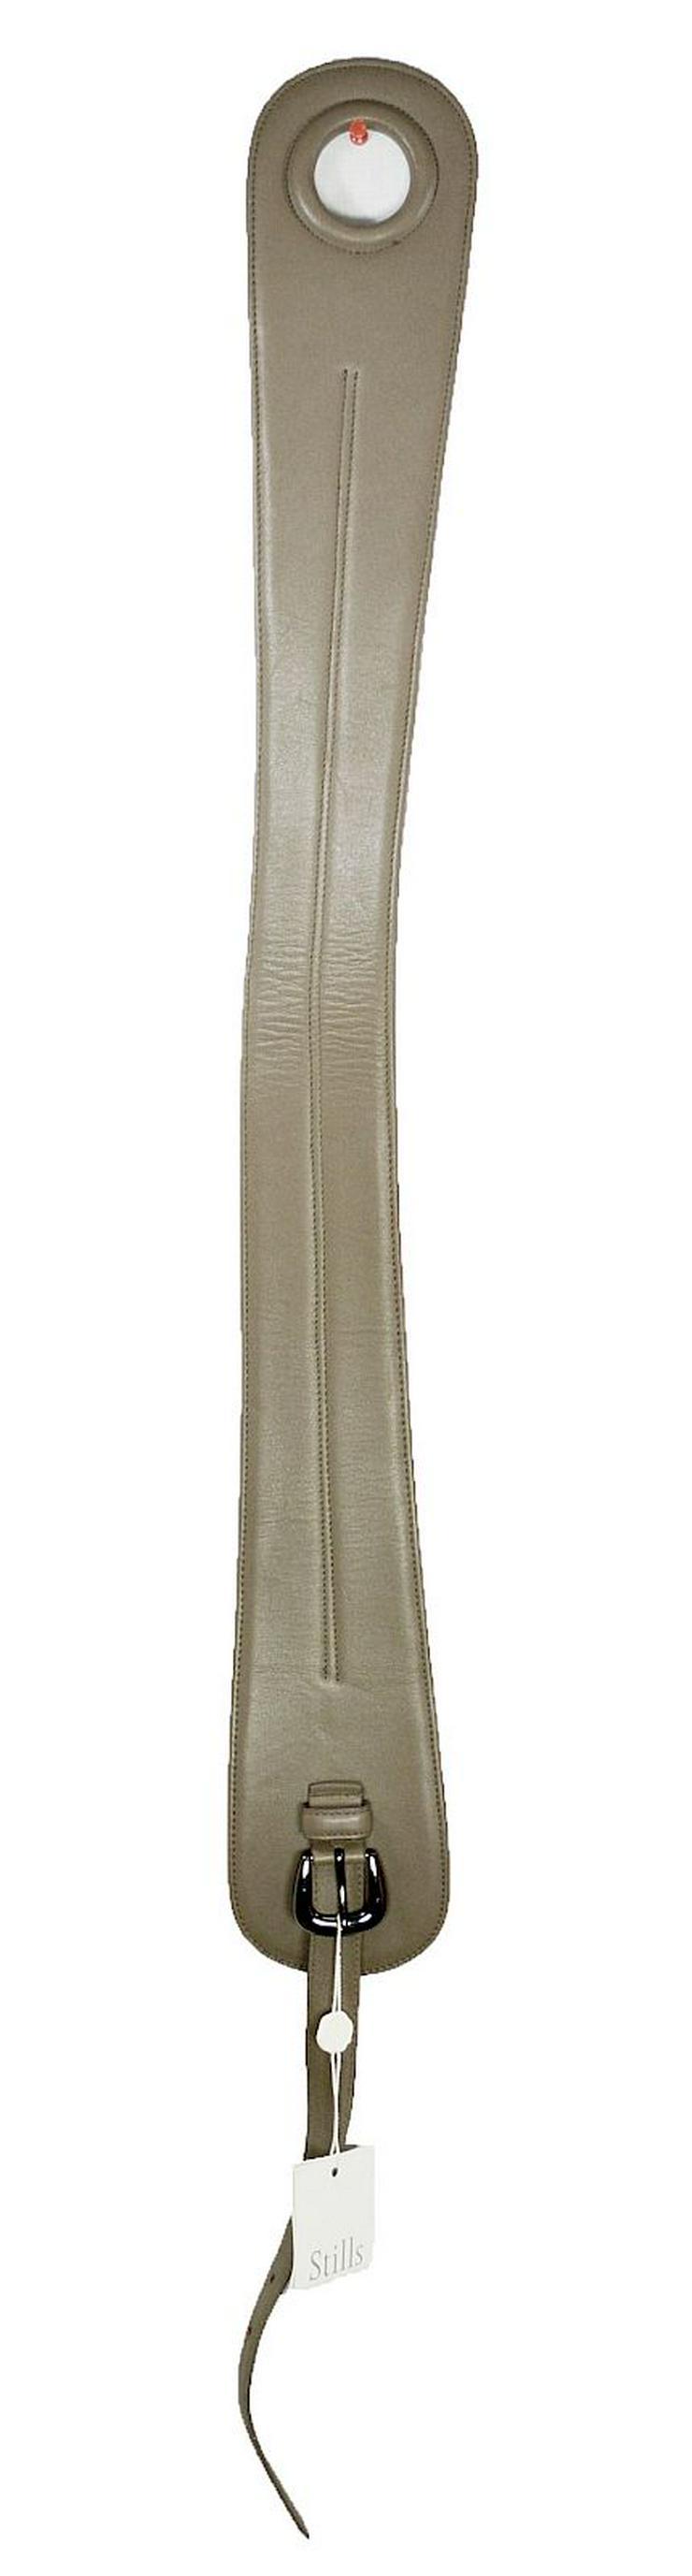 Stills Damen Gürtel 90 cm Echtes Leder Damengürtel 46111500